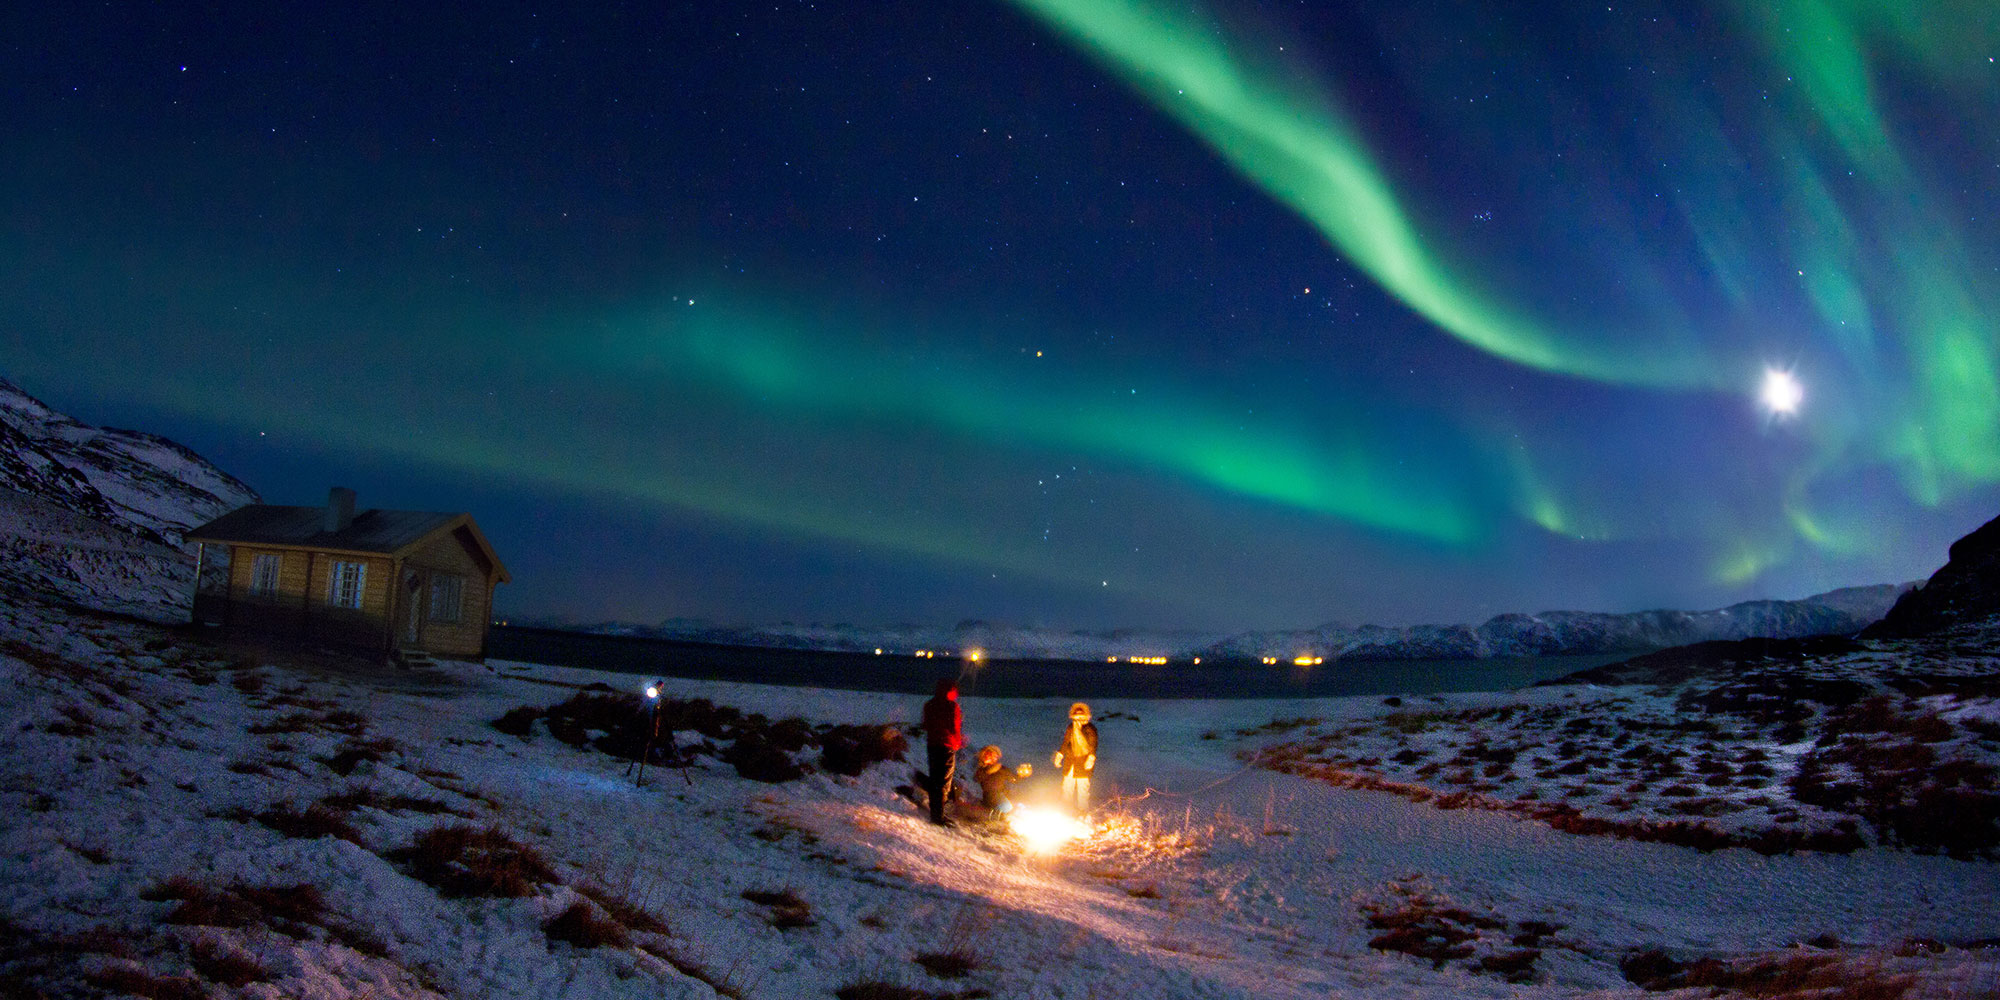 Роскошные пейзажи Норвегии - Страница 4 Northern_lights_hammerfest_northern_norway_2_1_f1196ca4-8214-42a9-90fa-b3c9ca9adbef